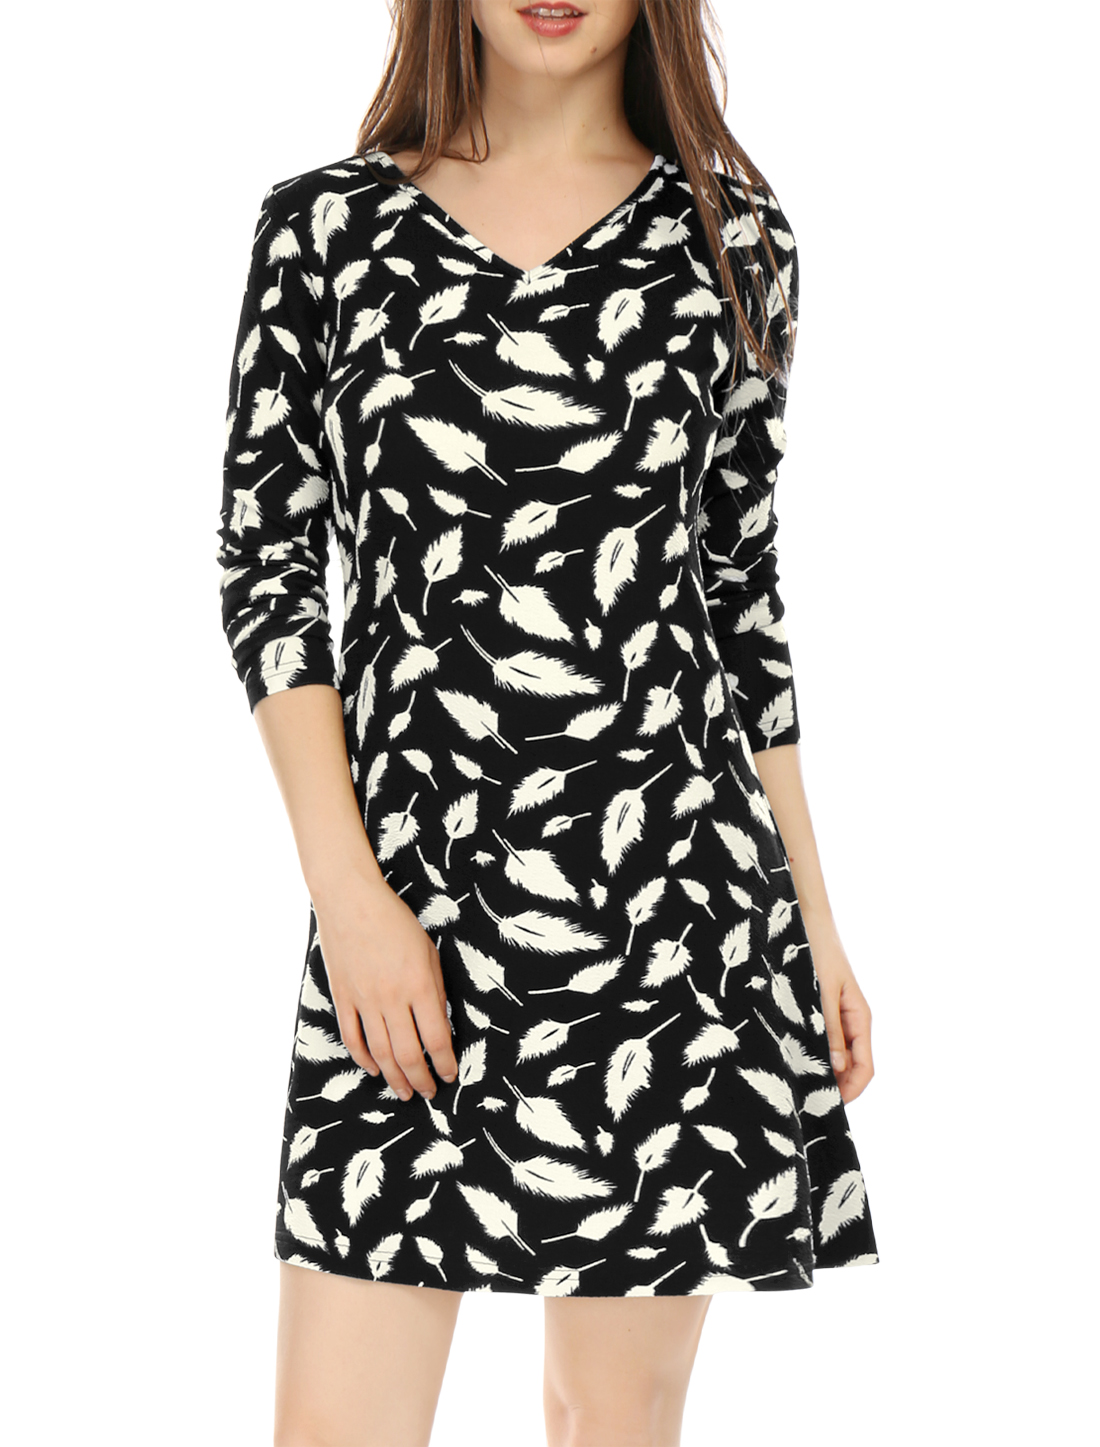 Women V Neck Long Sleeves Feather Print Mini Dress Black M